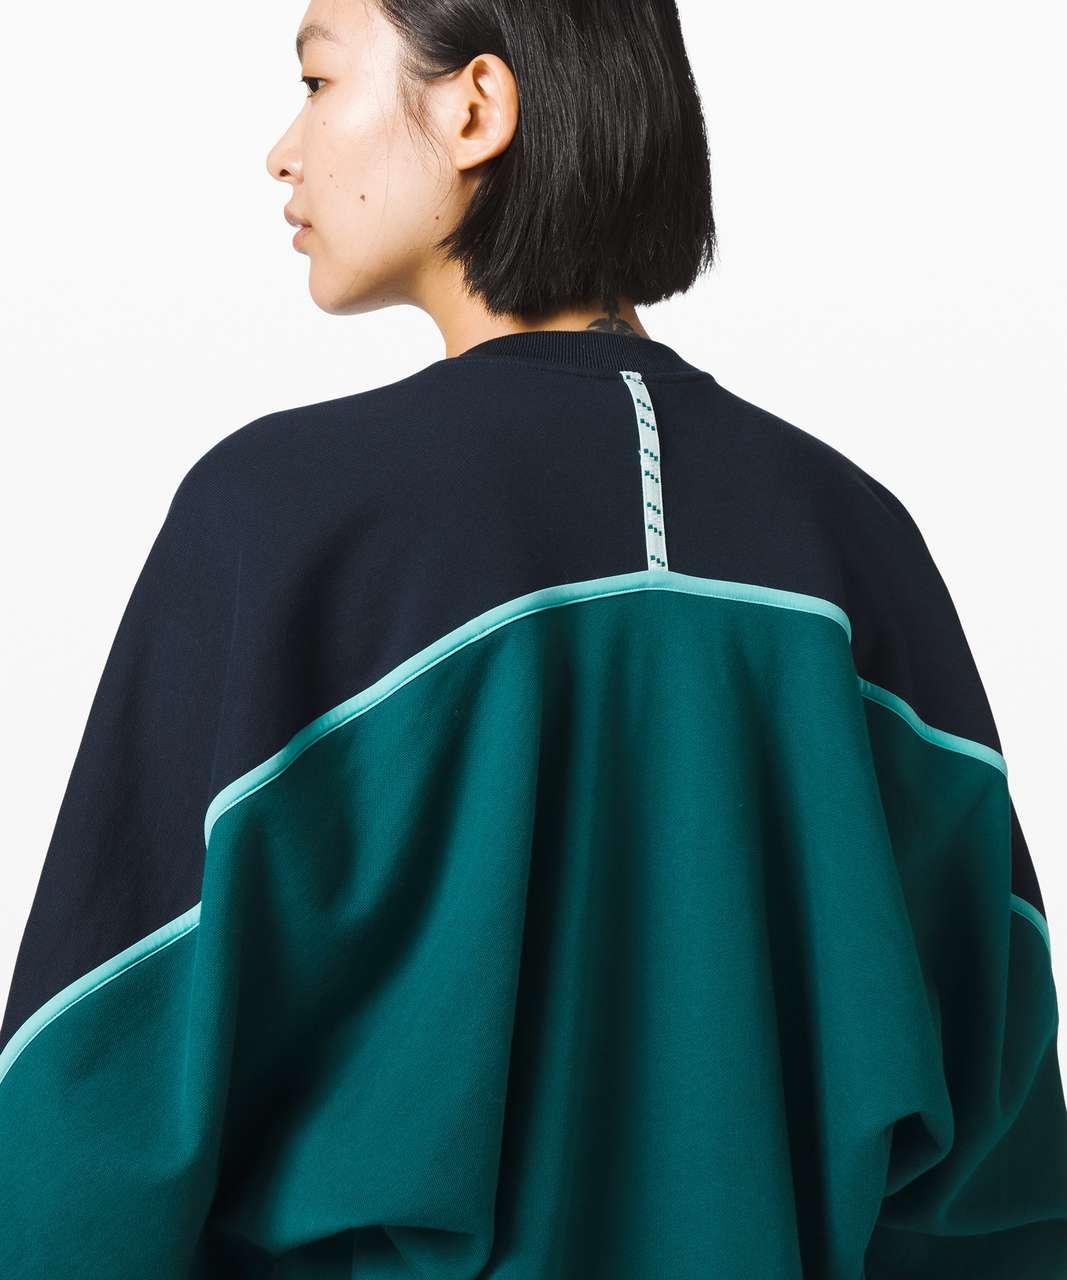 Lululemon Face Forward Sweatshirt *lululemon x Roksanda - True Navy / Emerald / Arctic Teal